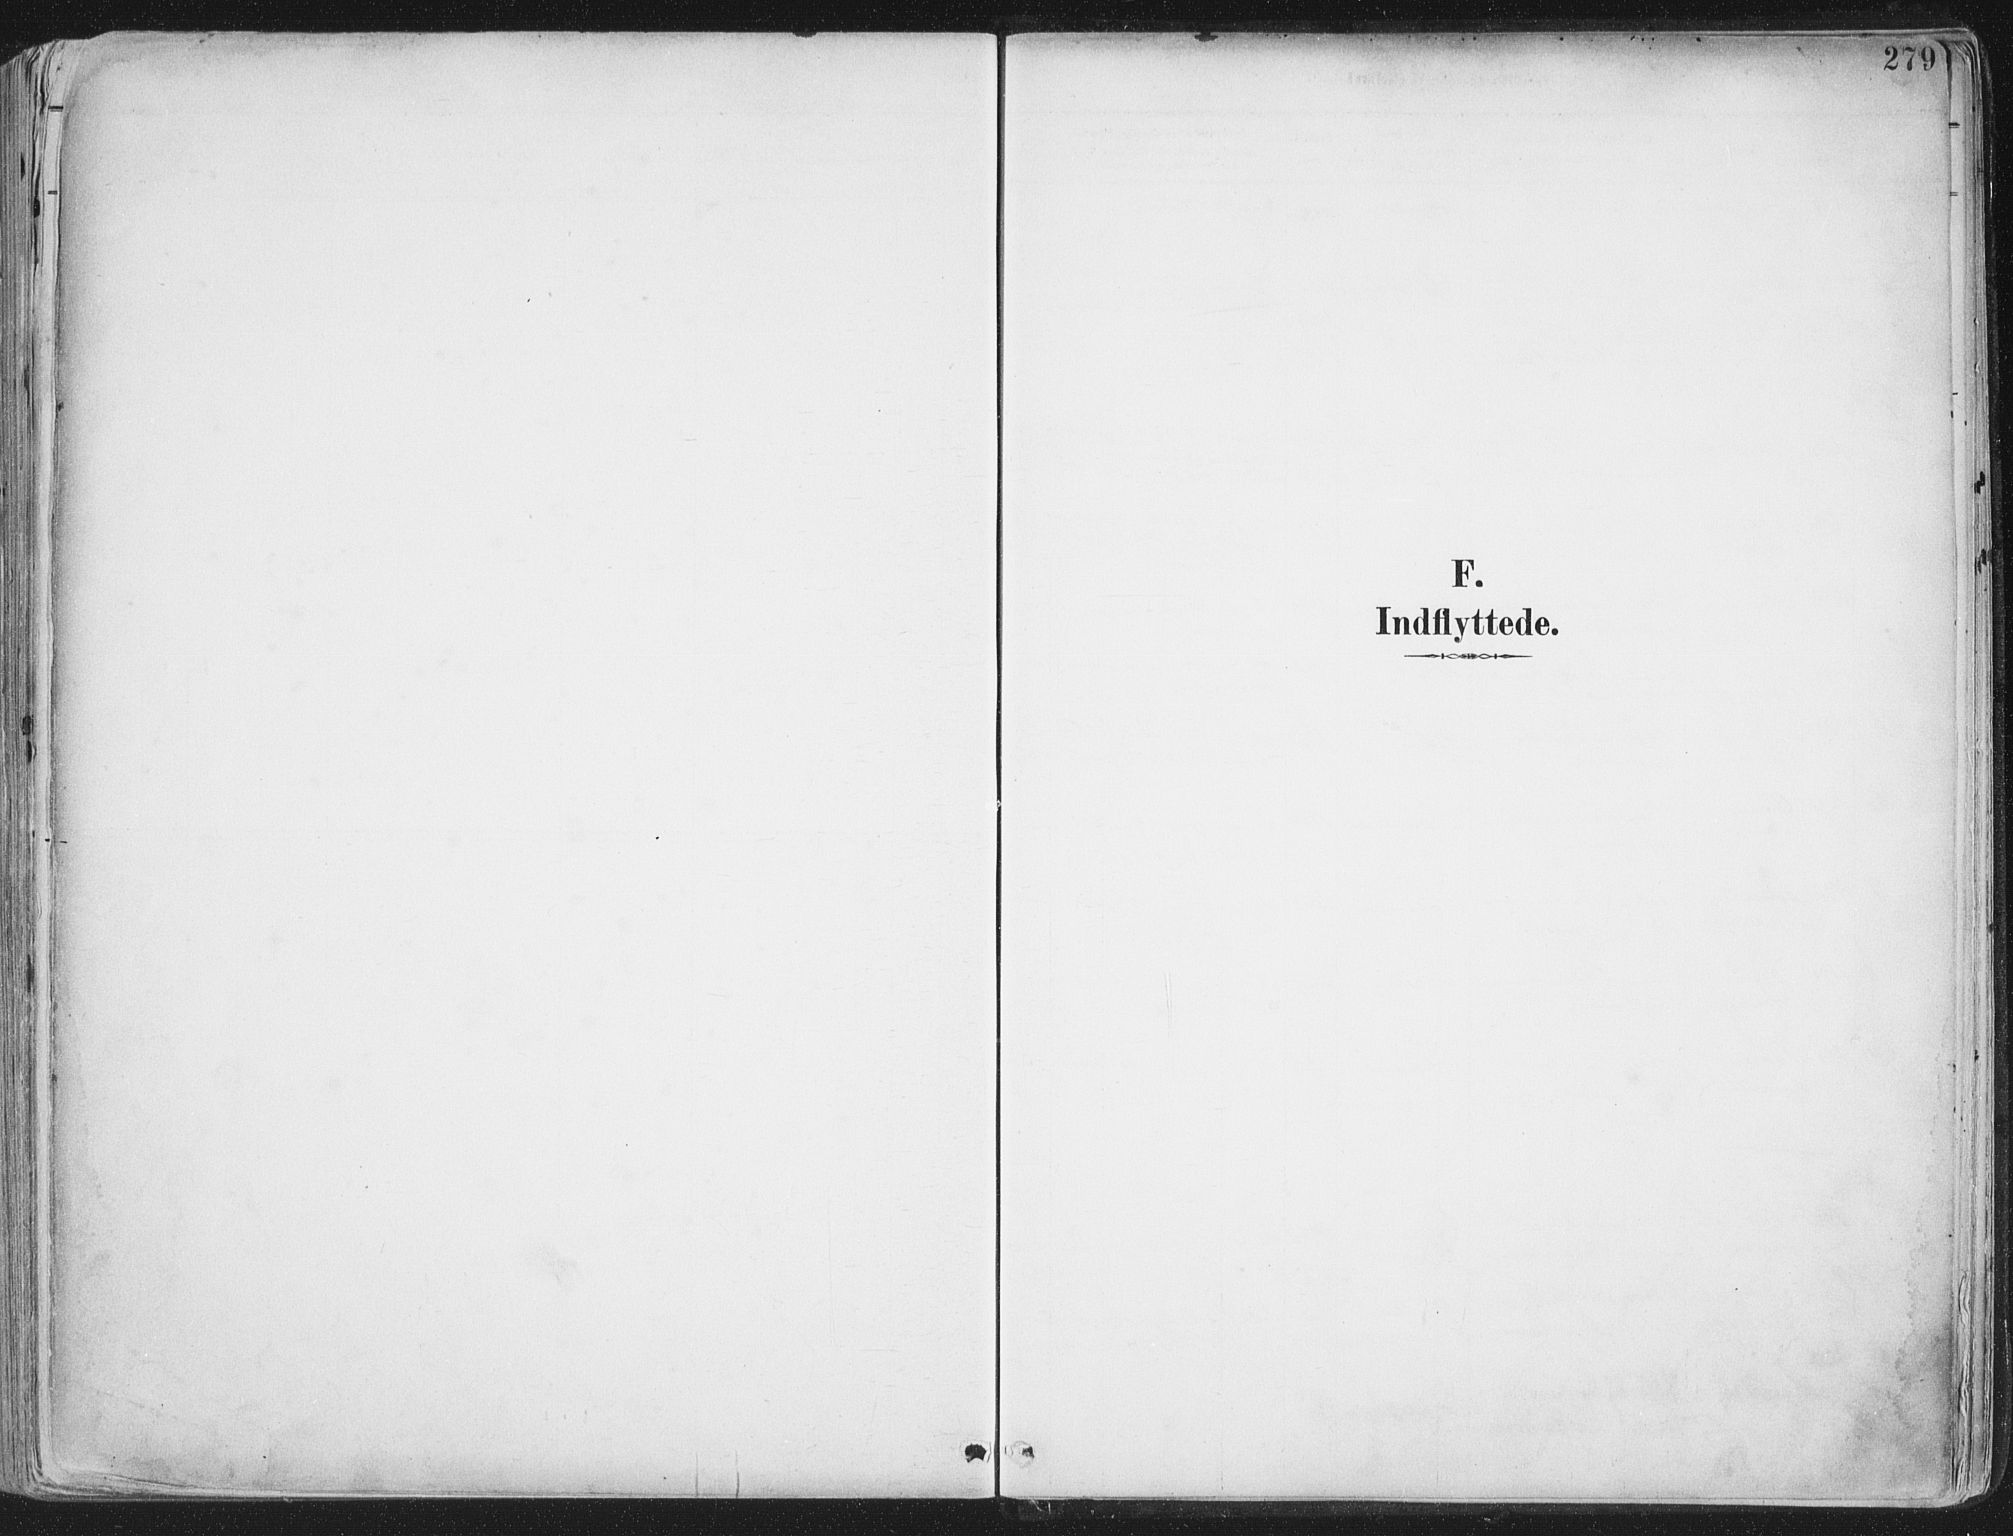 SAT, Ministerialprotokoller, klokkerbøker og fødselsregistre - Nordland, 888/L1246: Ministerialbok nr. 888A12, 1891-1903, s. 279